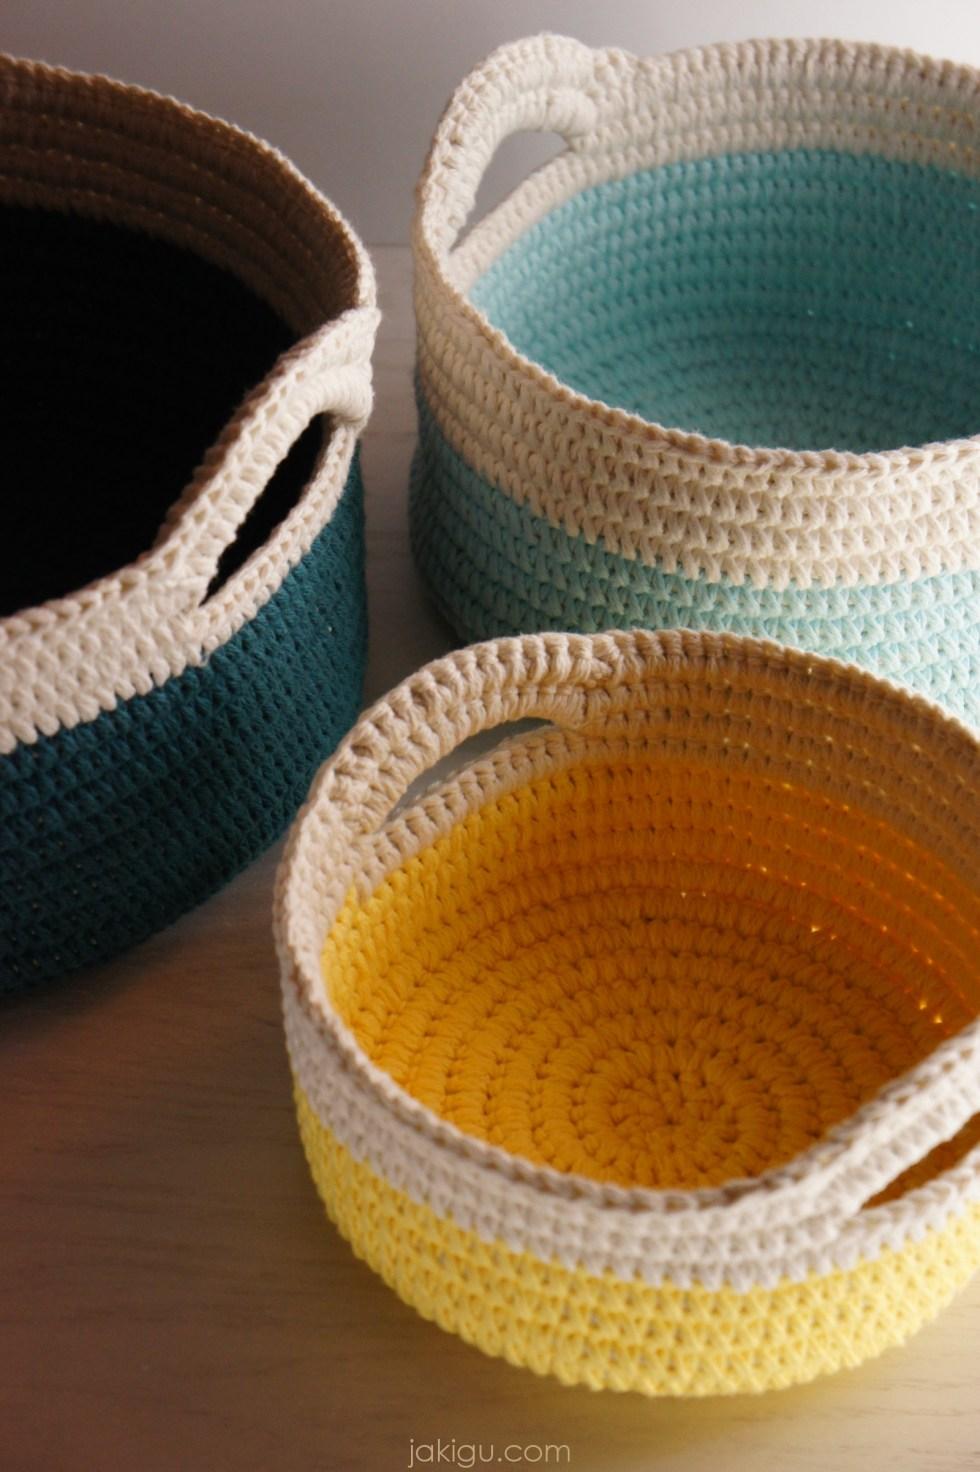 Sturdy crochet baskets with handles - a nesting set